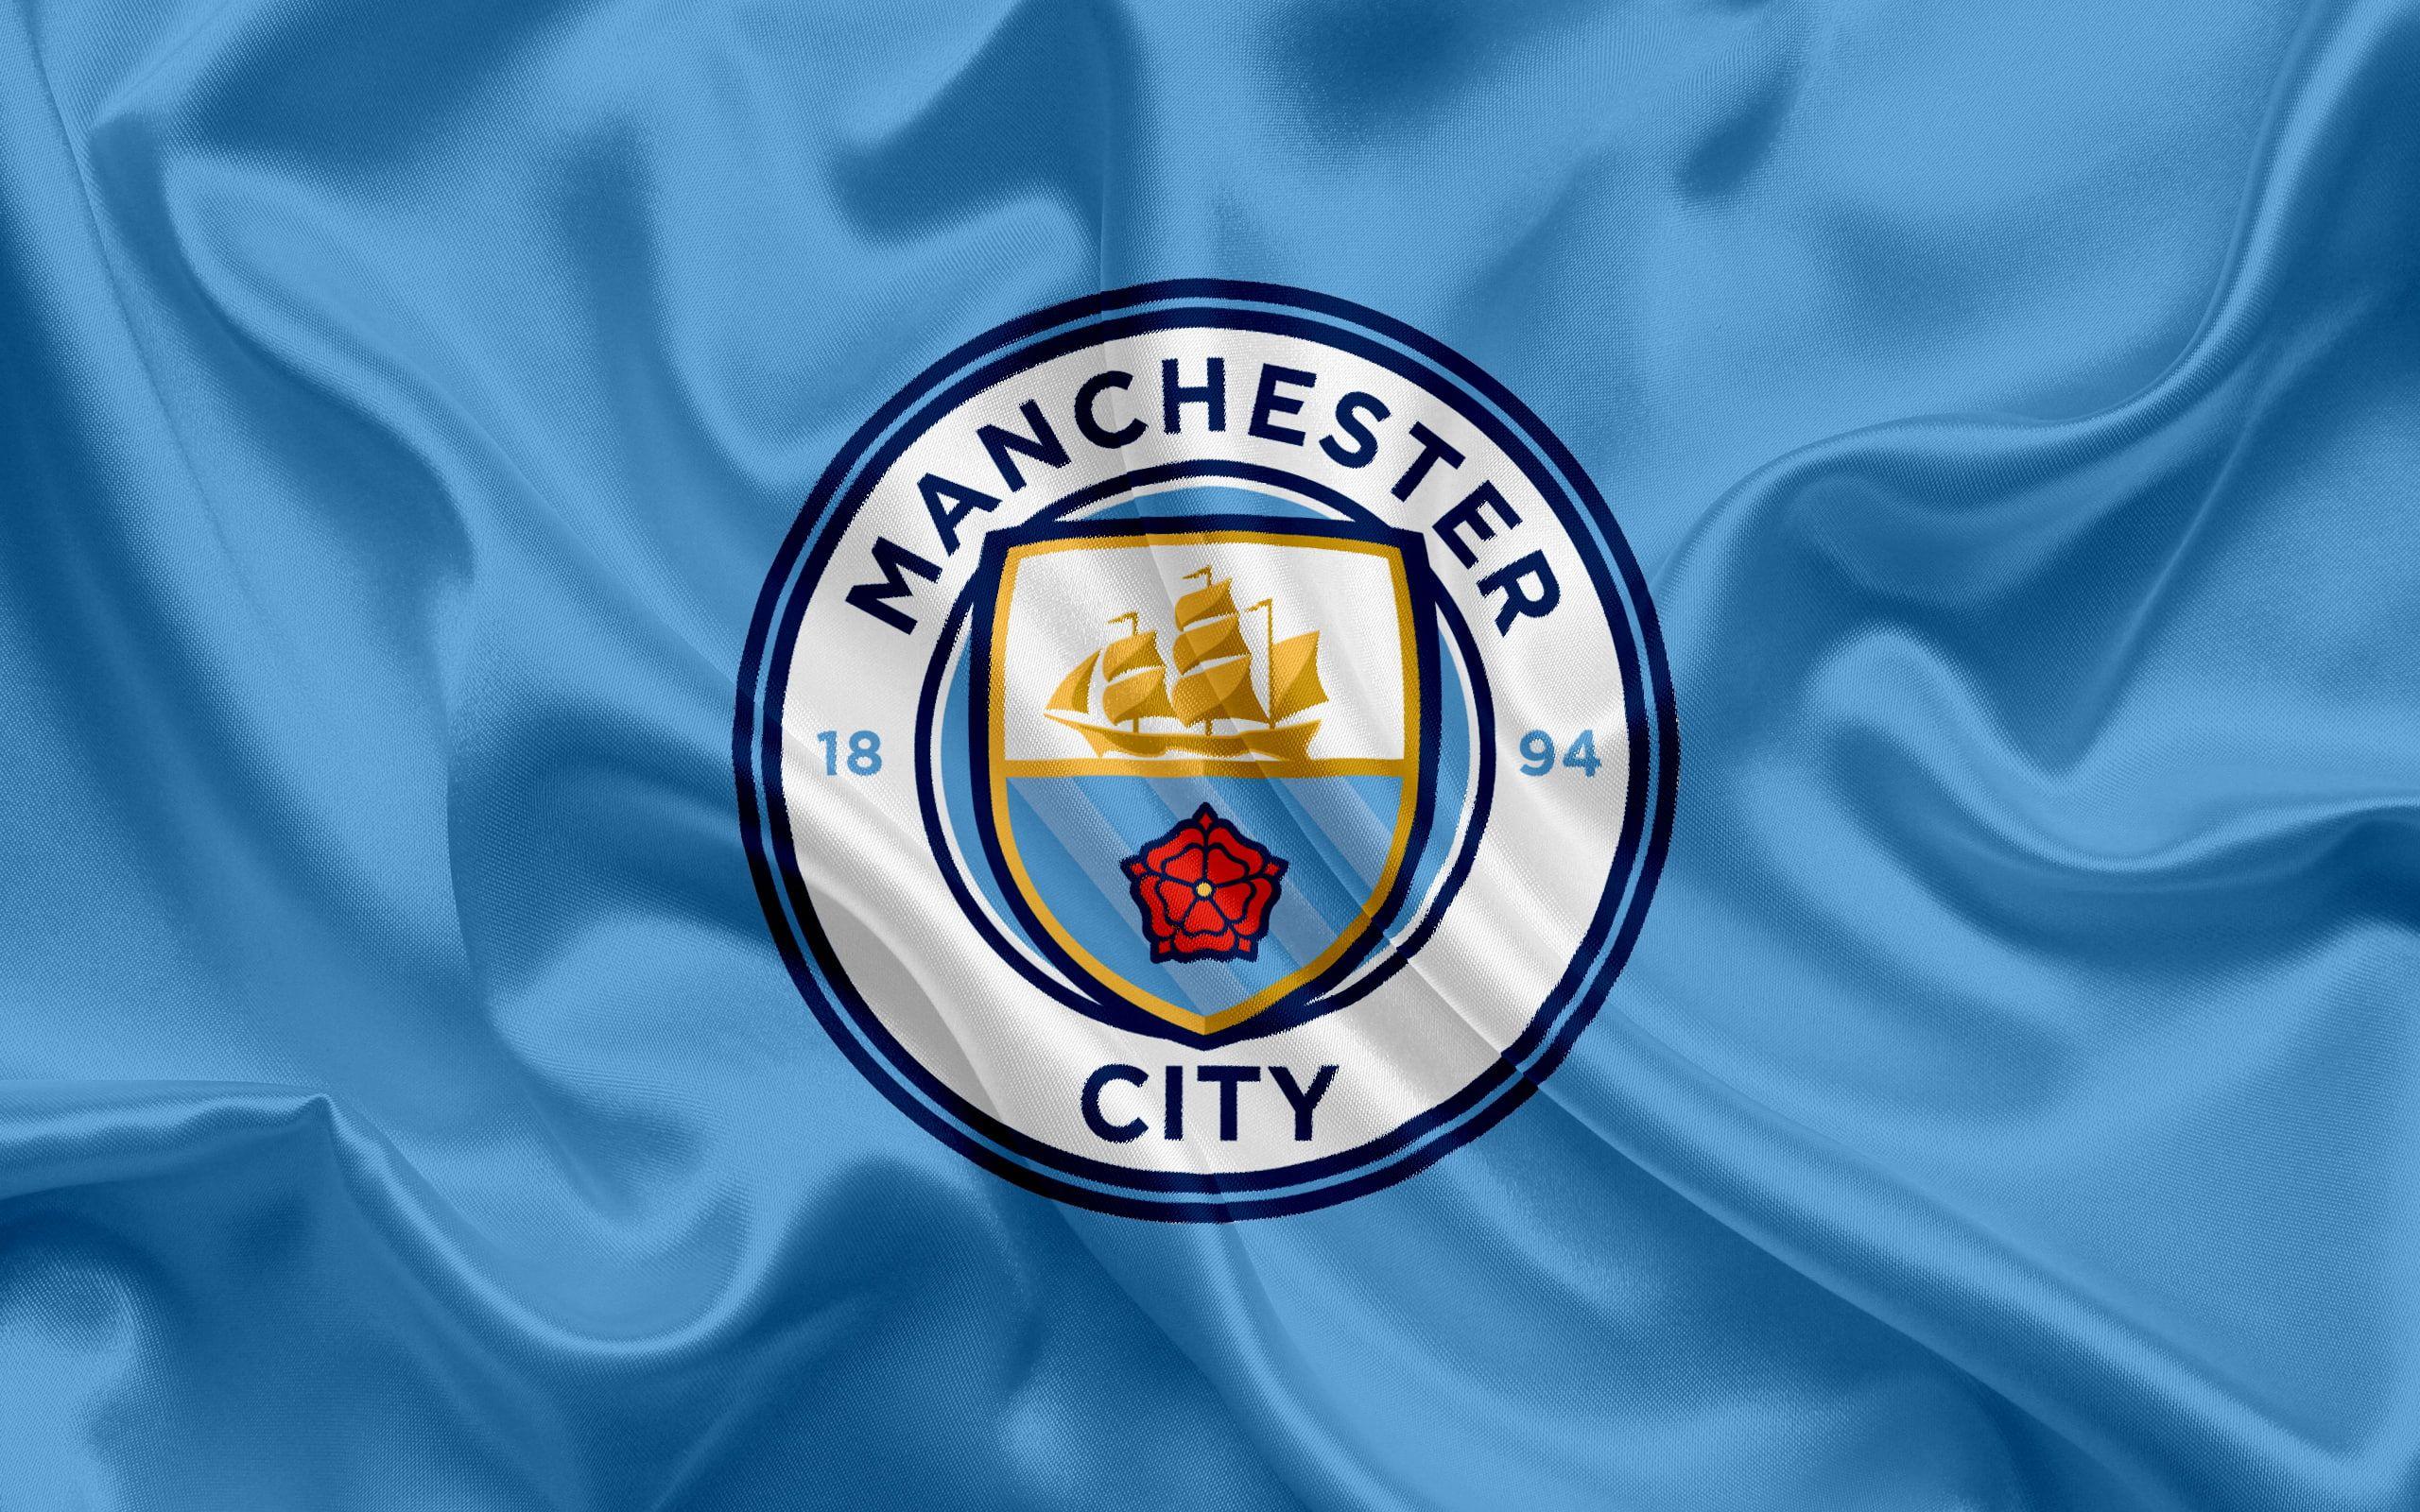 Soccer Manchester City F C Logo 2k Wallpaper Hdwallpaper Desktop Manchester City Wallpaper Manchester City Logo Manchester City